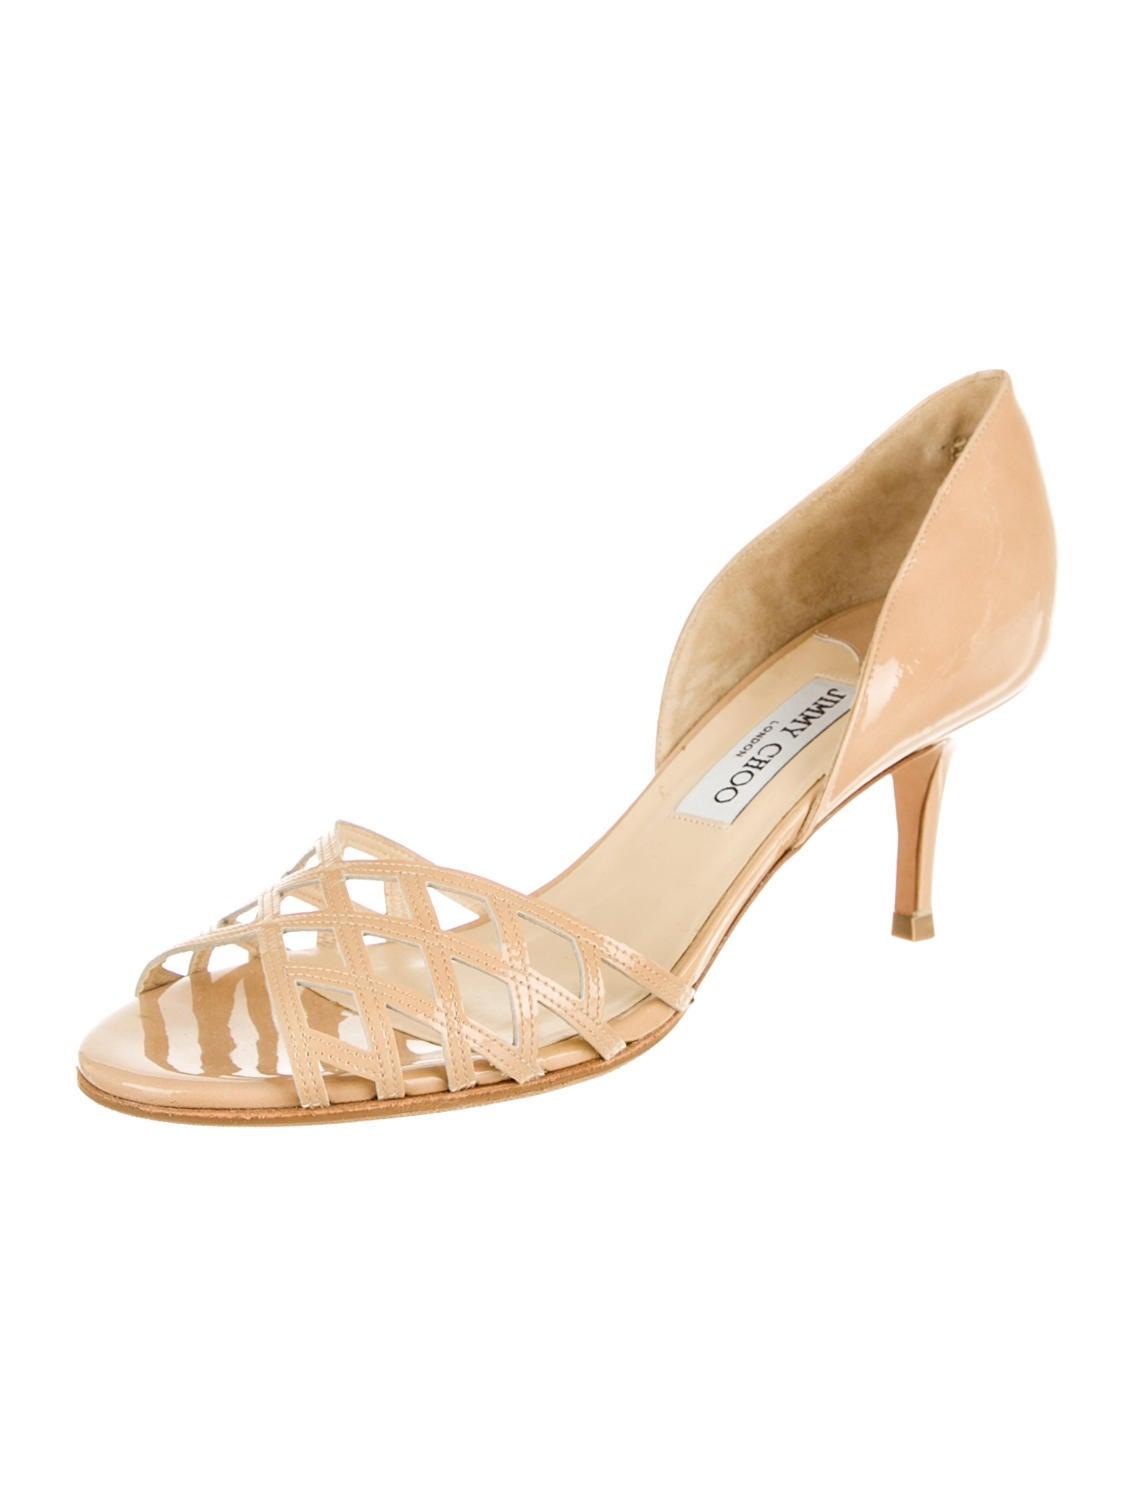 jimmy choo pumps shoes jim29518 the realreal